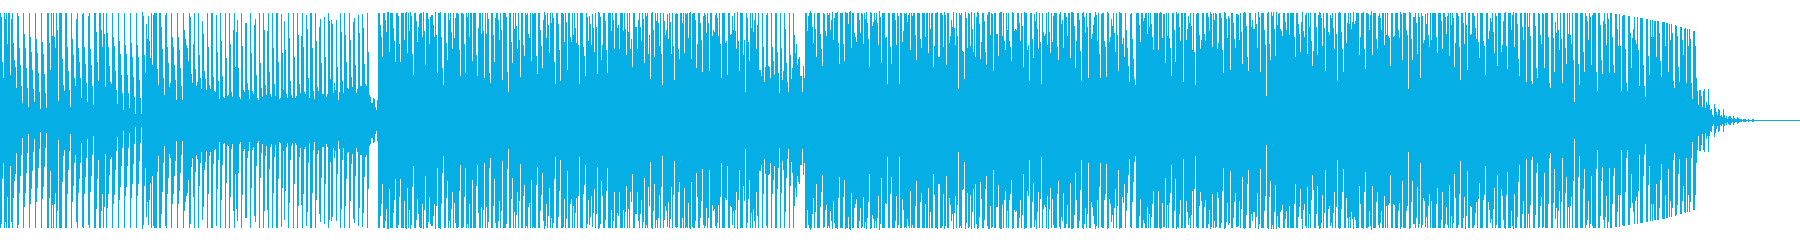 BGMに最適!爽やかなハウスミュージックの再生済みの波形